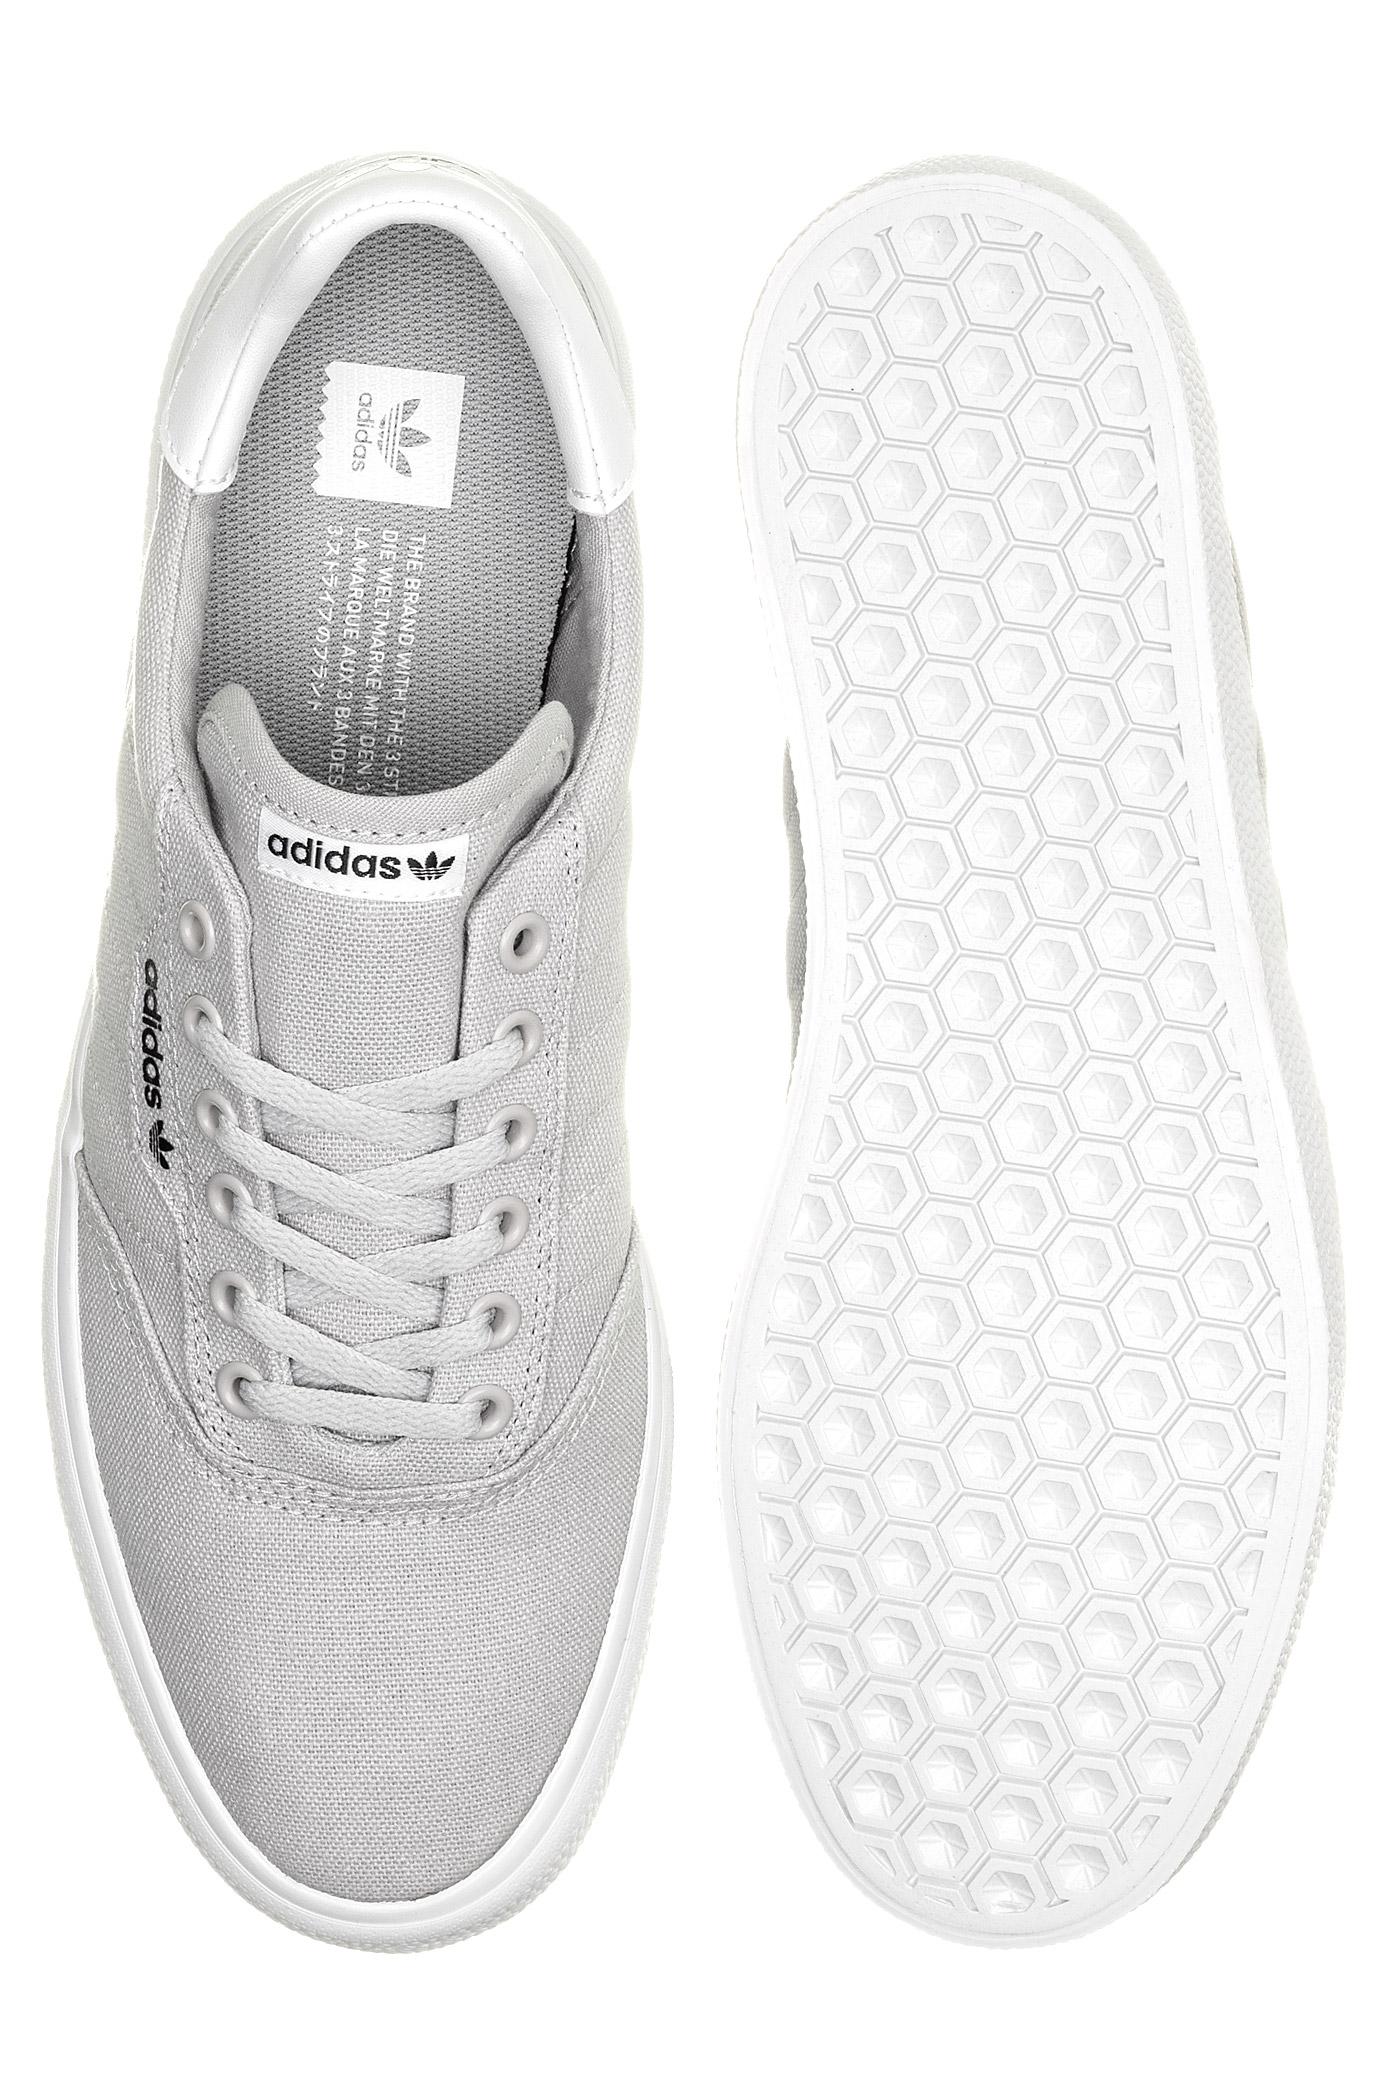 Solid Grey Skateboarding 3mc Light Chaussurelight Gre Adidas rWxodCBe